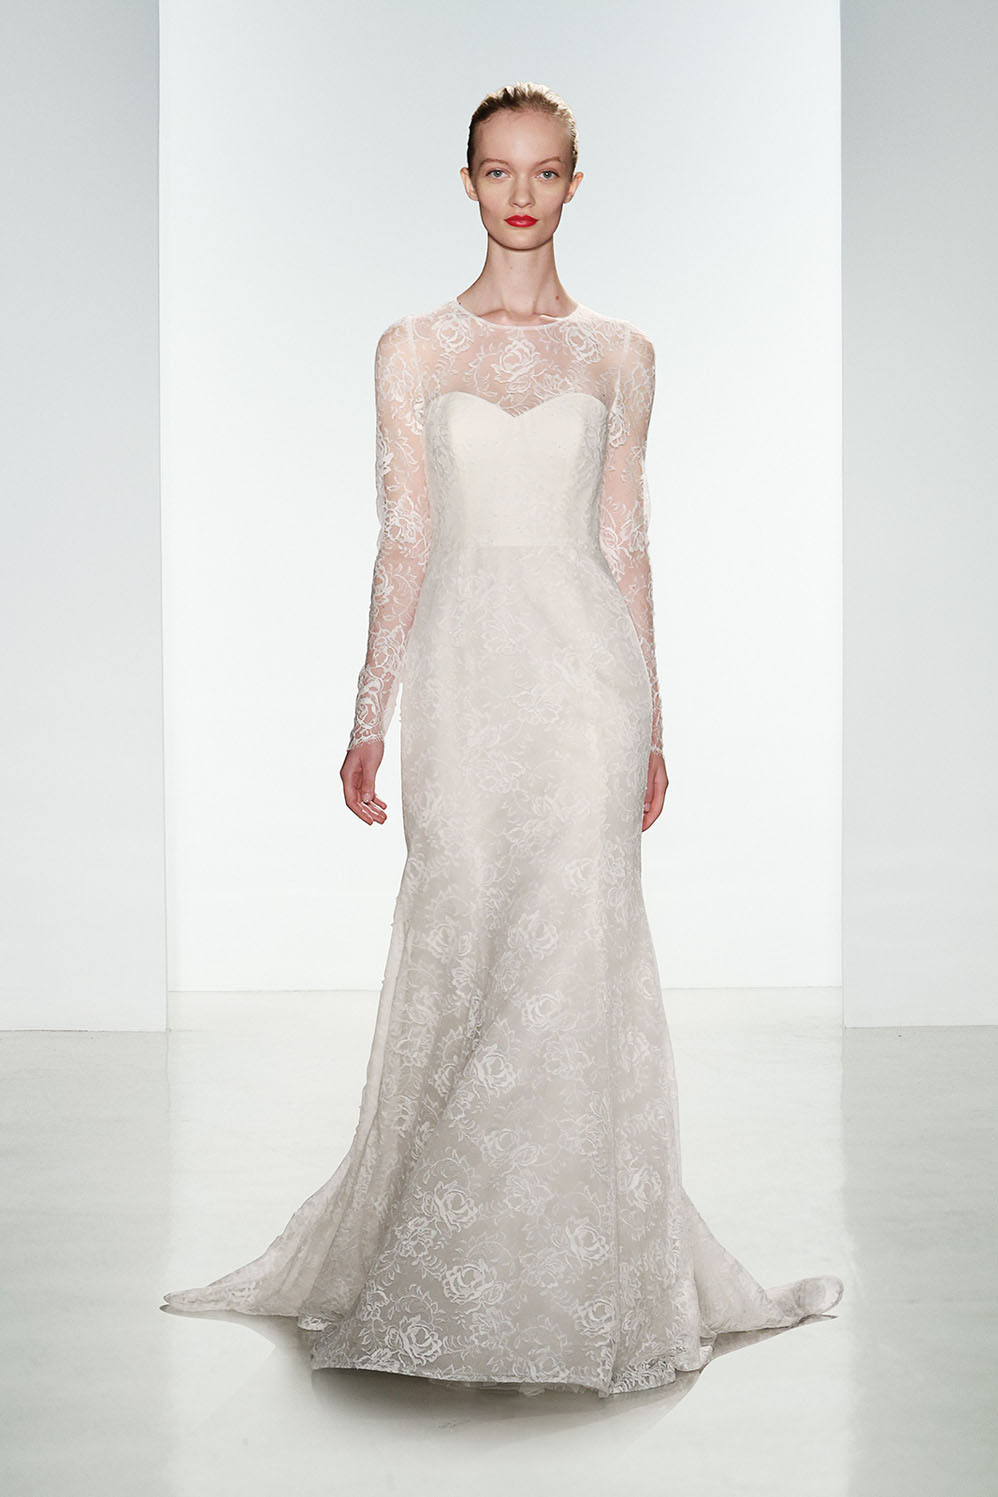 lace-long-sleeve-wedding-dress-amsale-tegan.jpg